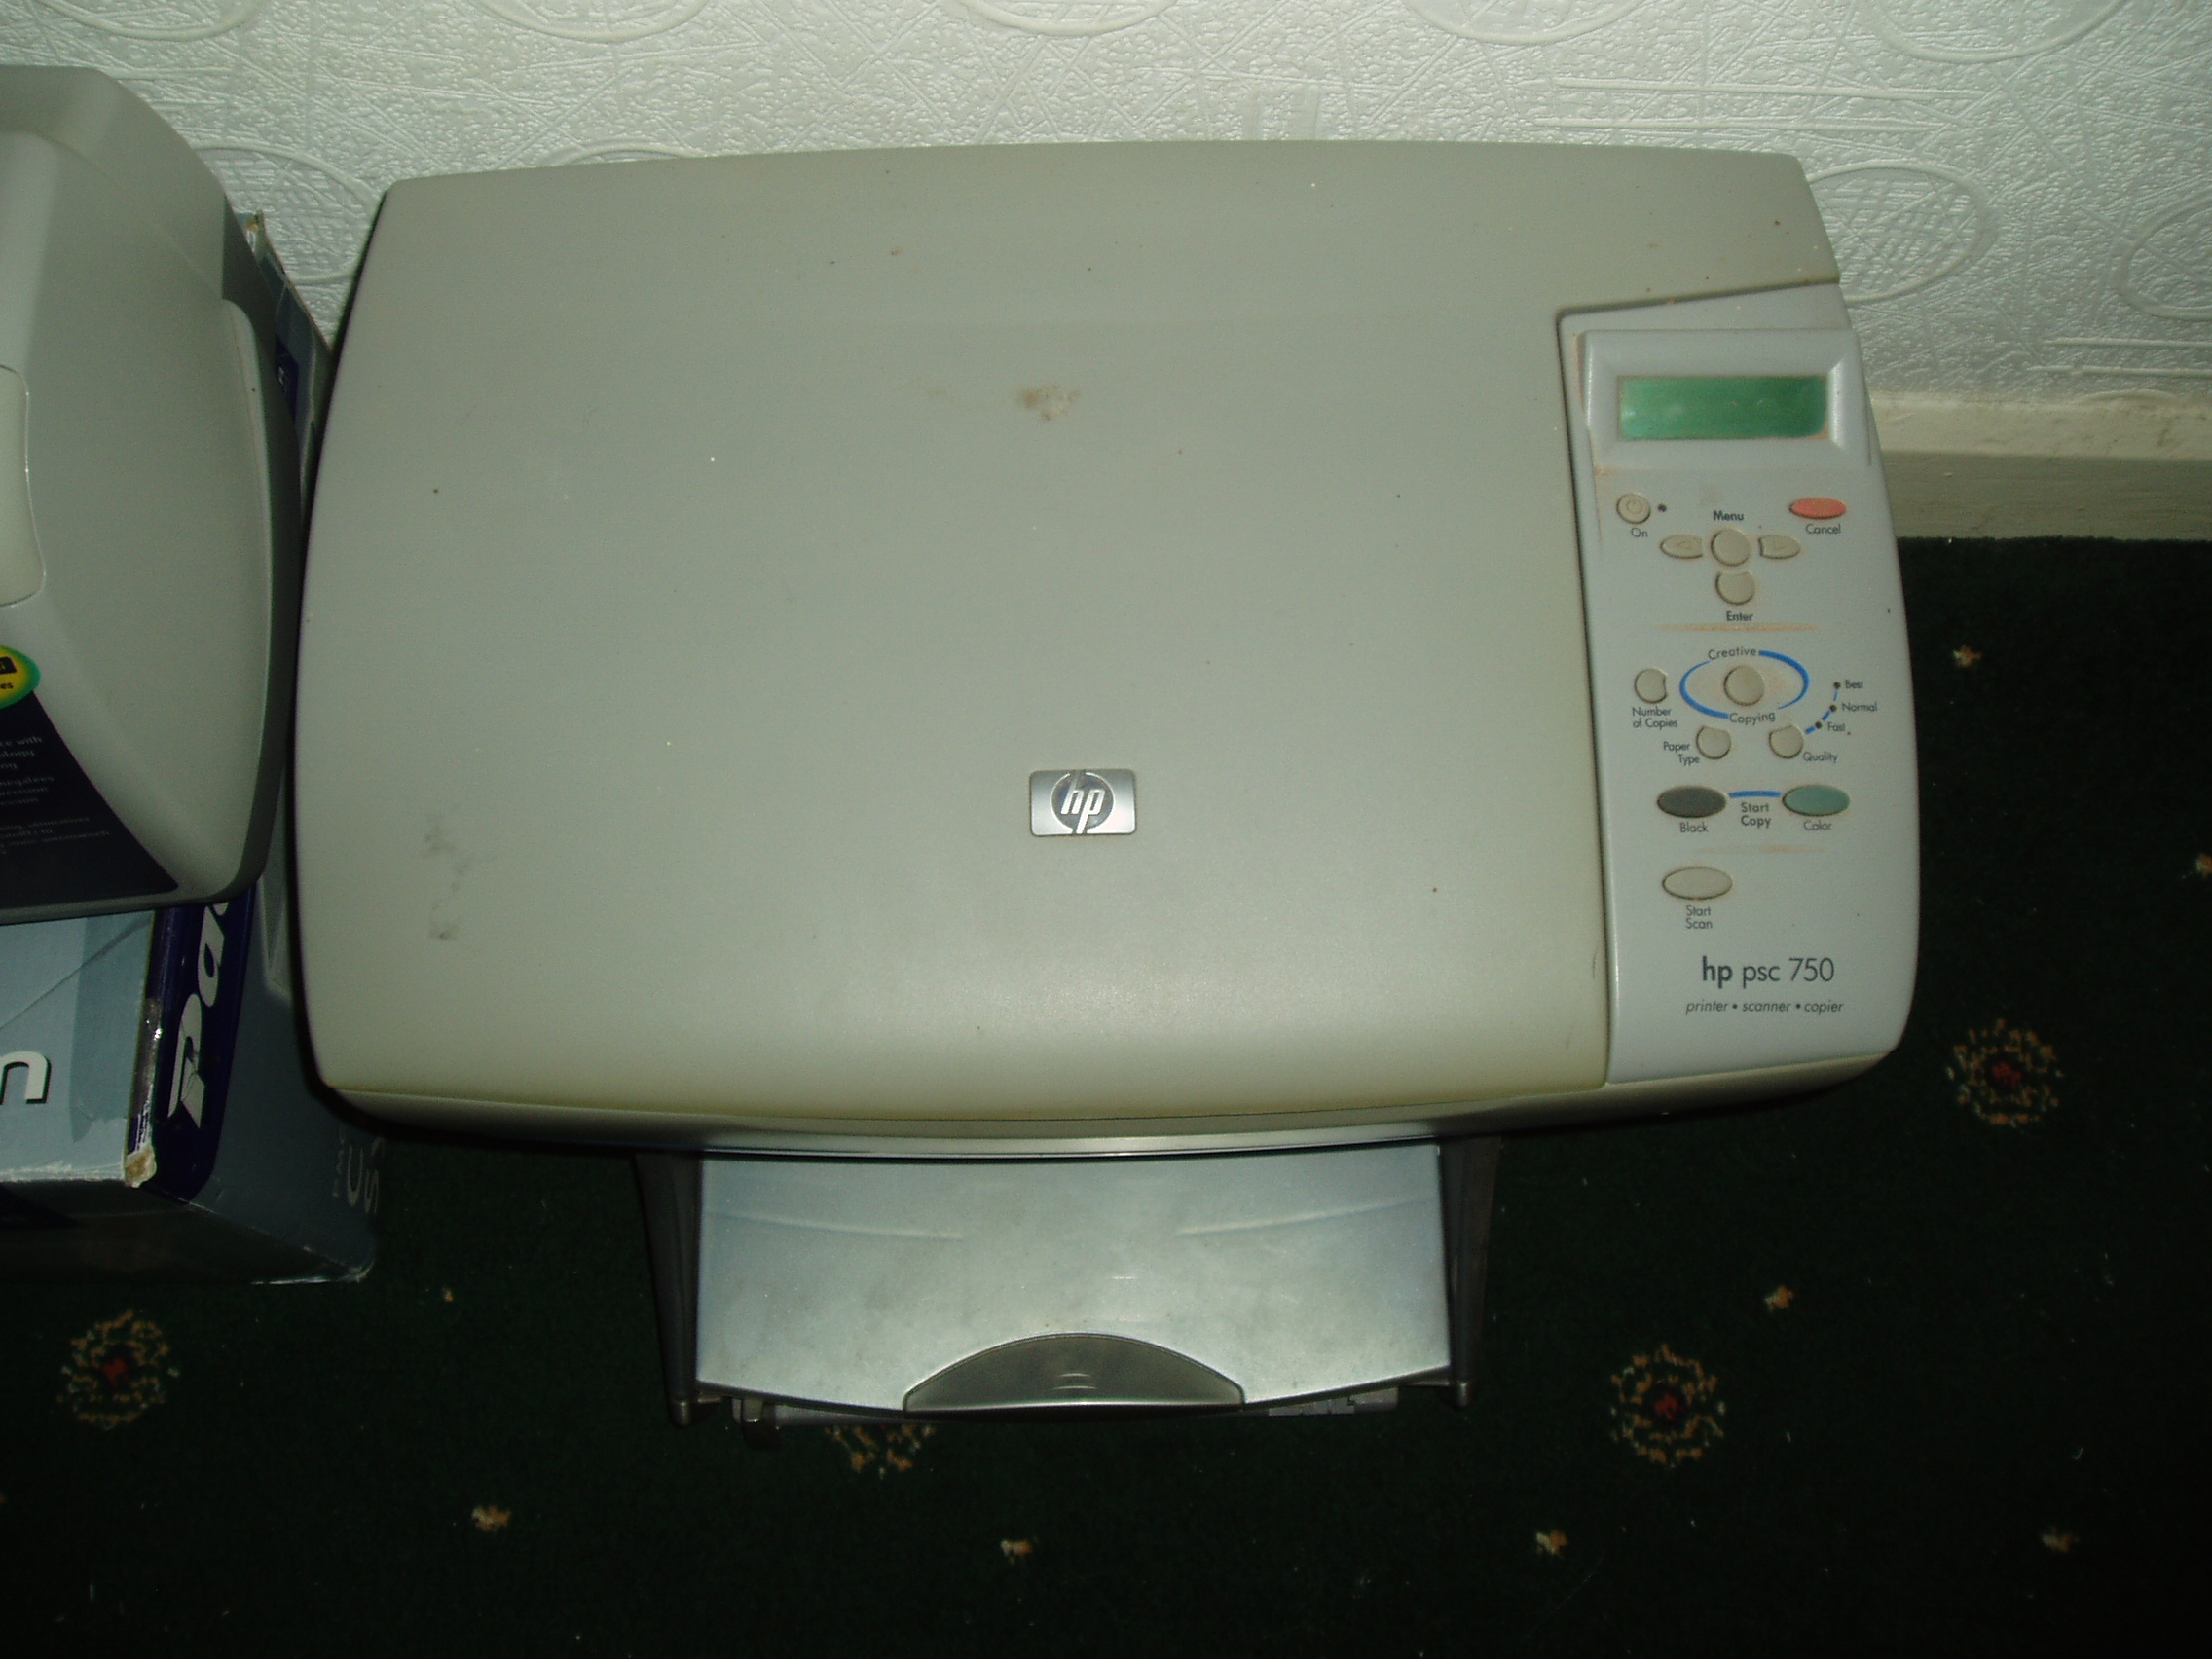 P1011824.JPG